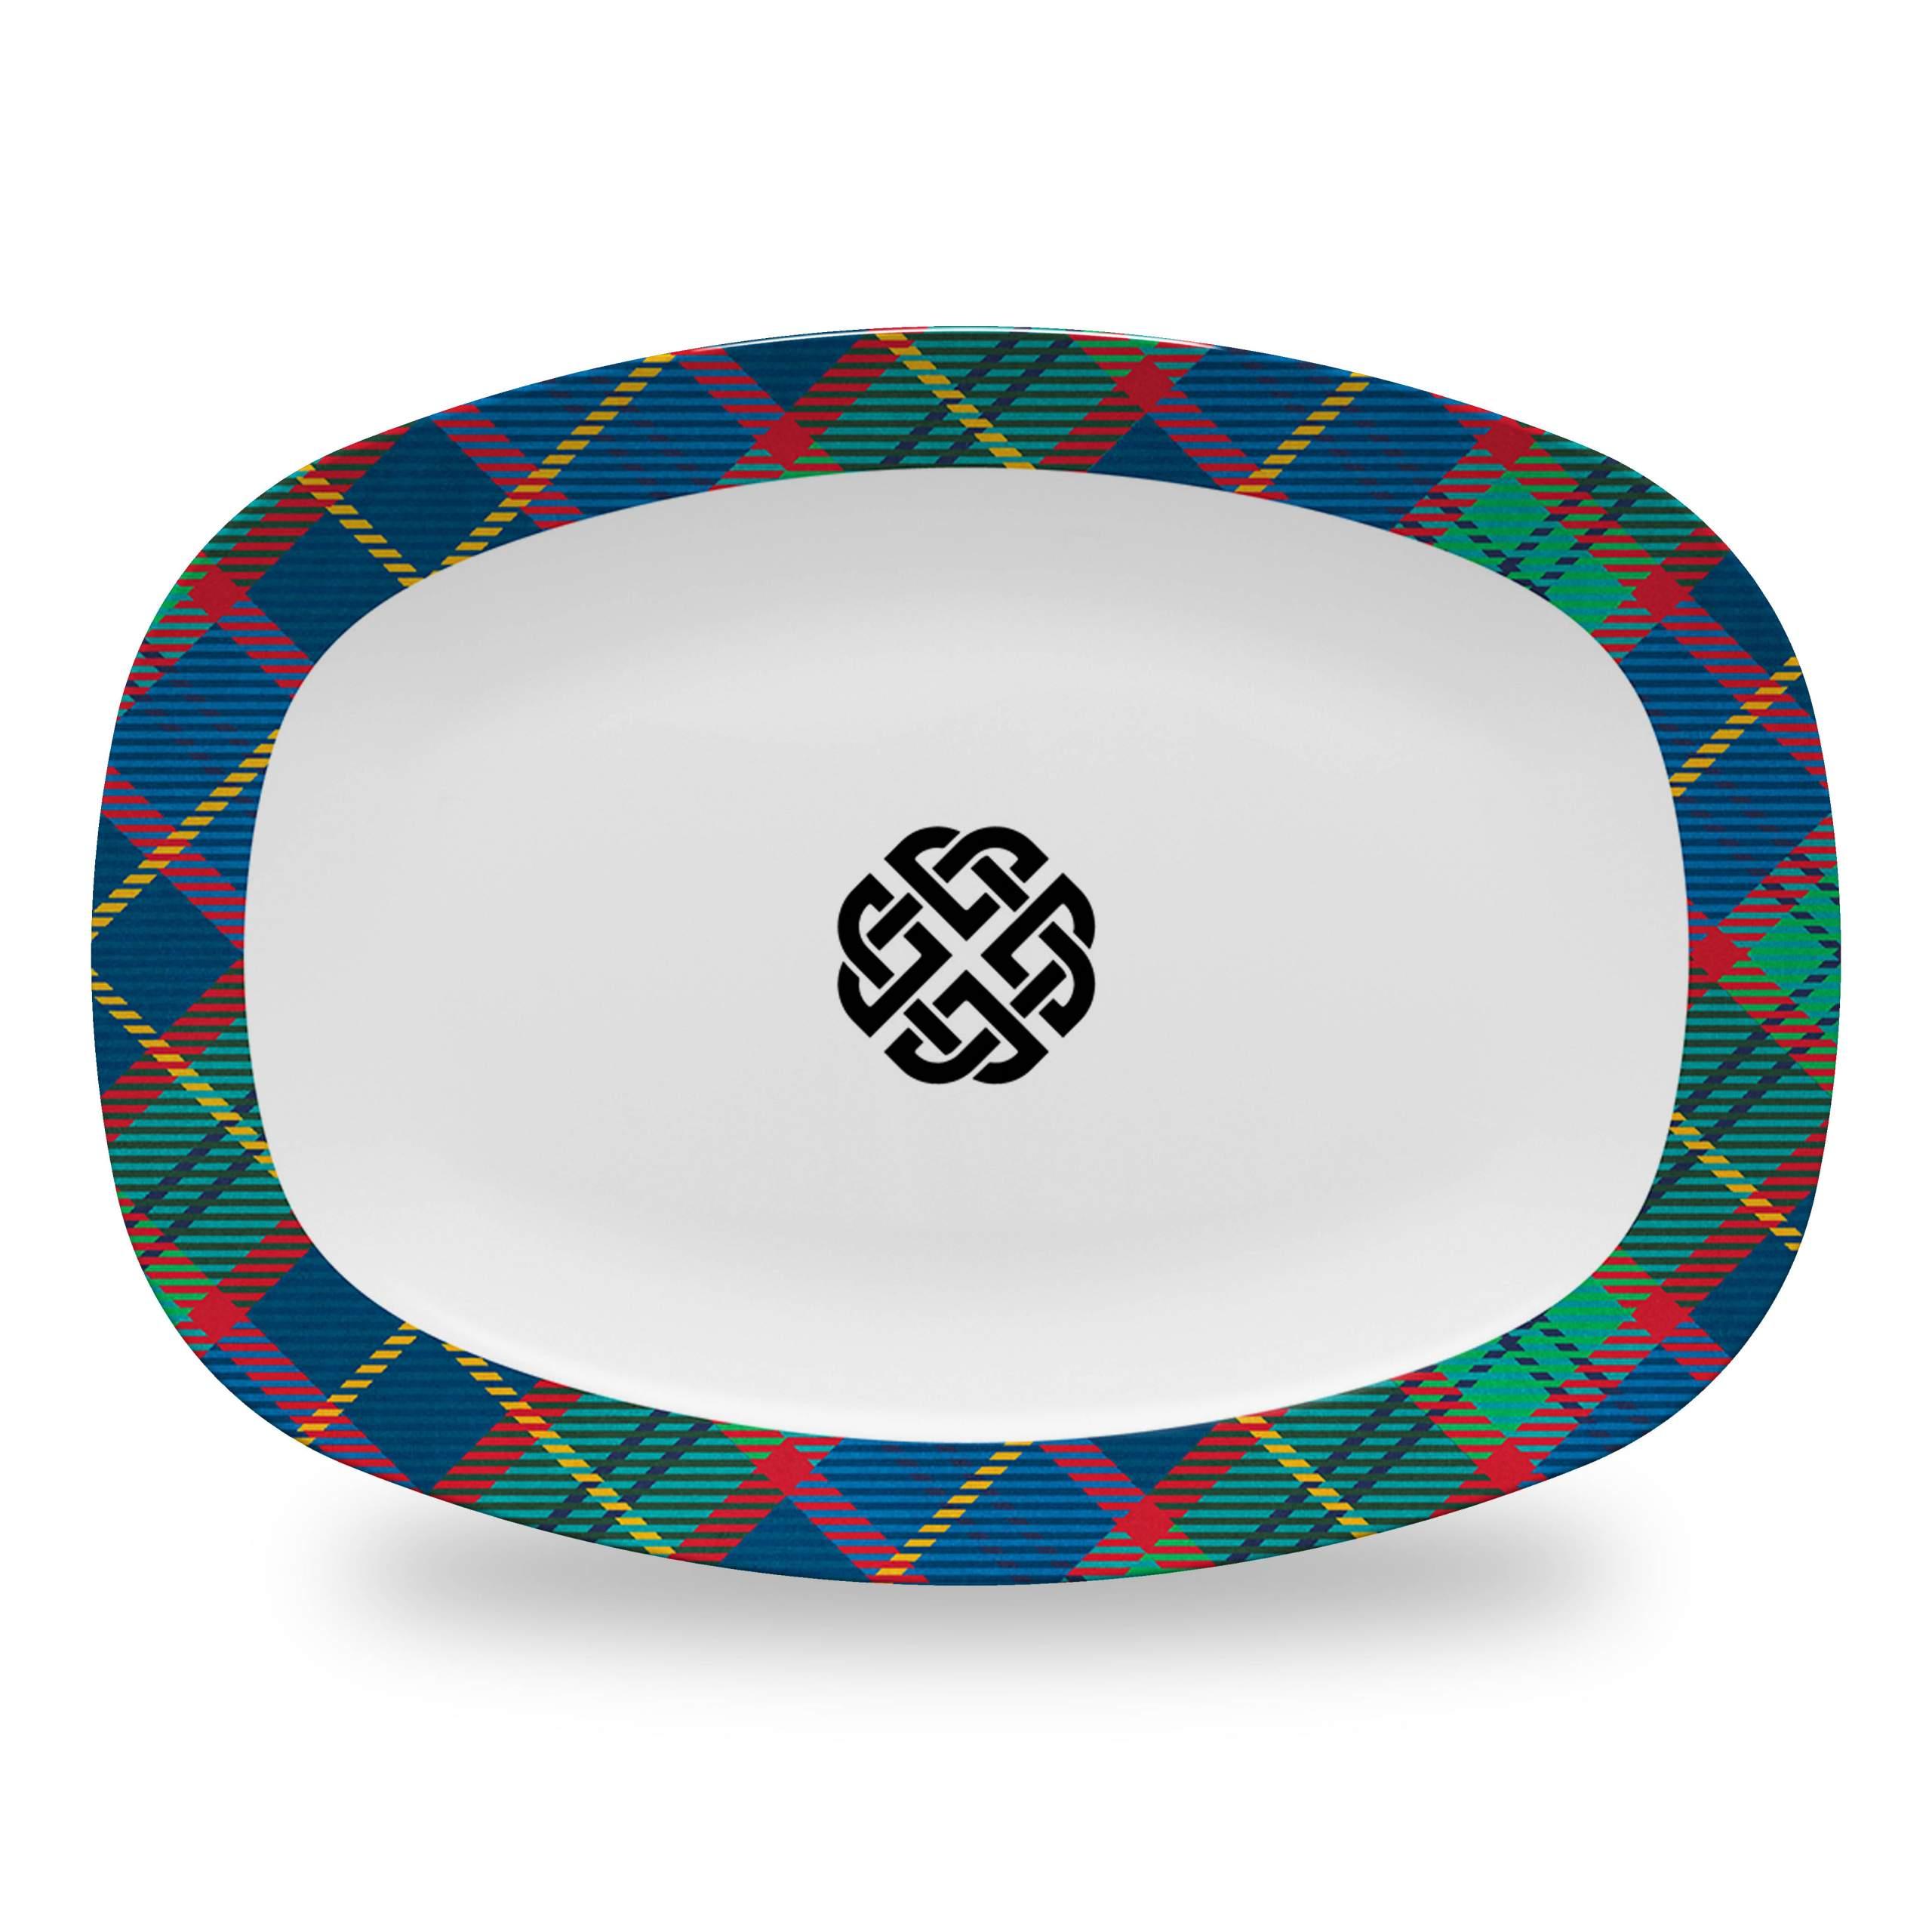 Tartan Platter with Celtic Knot